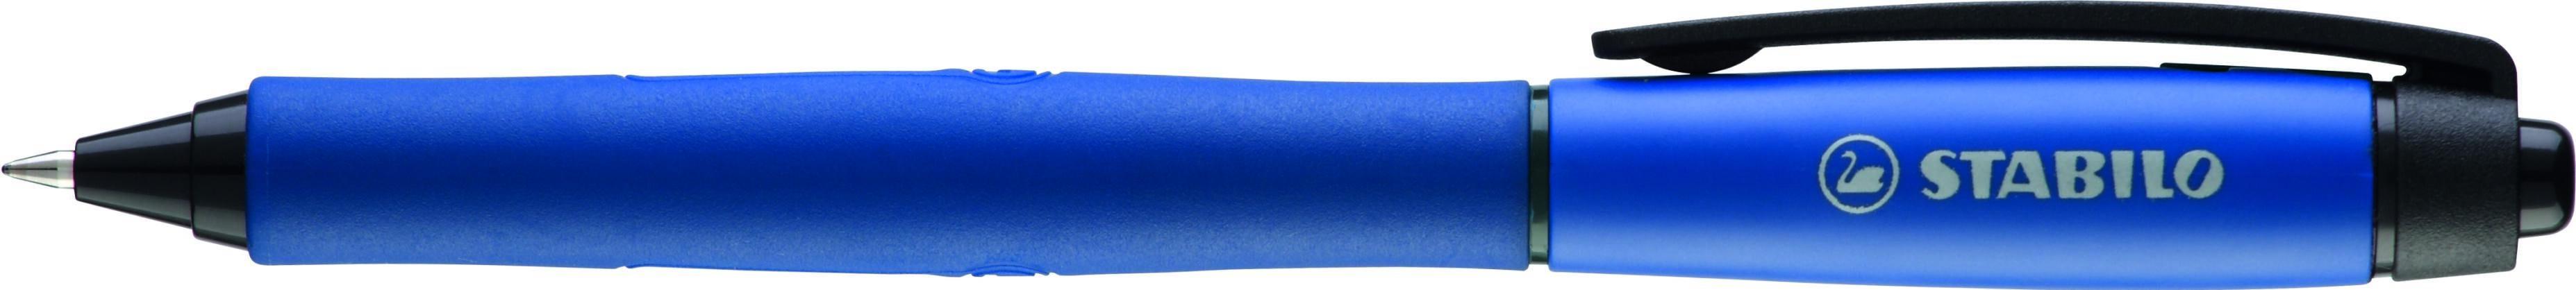 STABILO Palette - Roller - 0,5mm - bleu